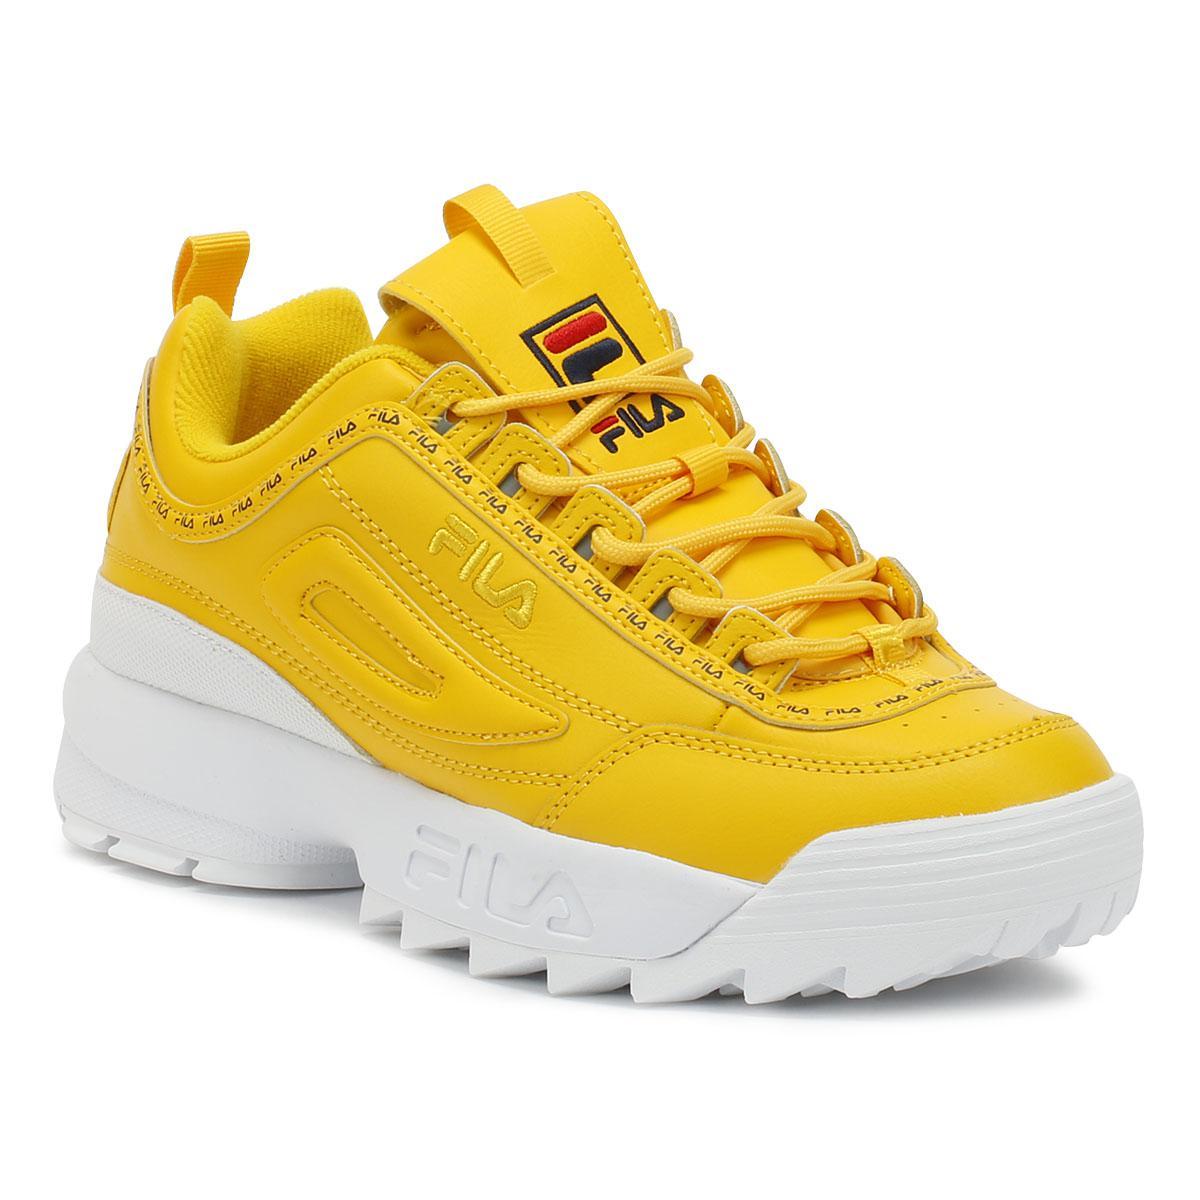 122cbc614033 Lyst Fila Disruptor Ii Premium Repeat Womens Citrus Yellow